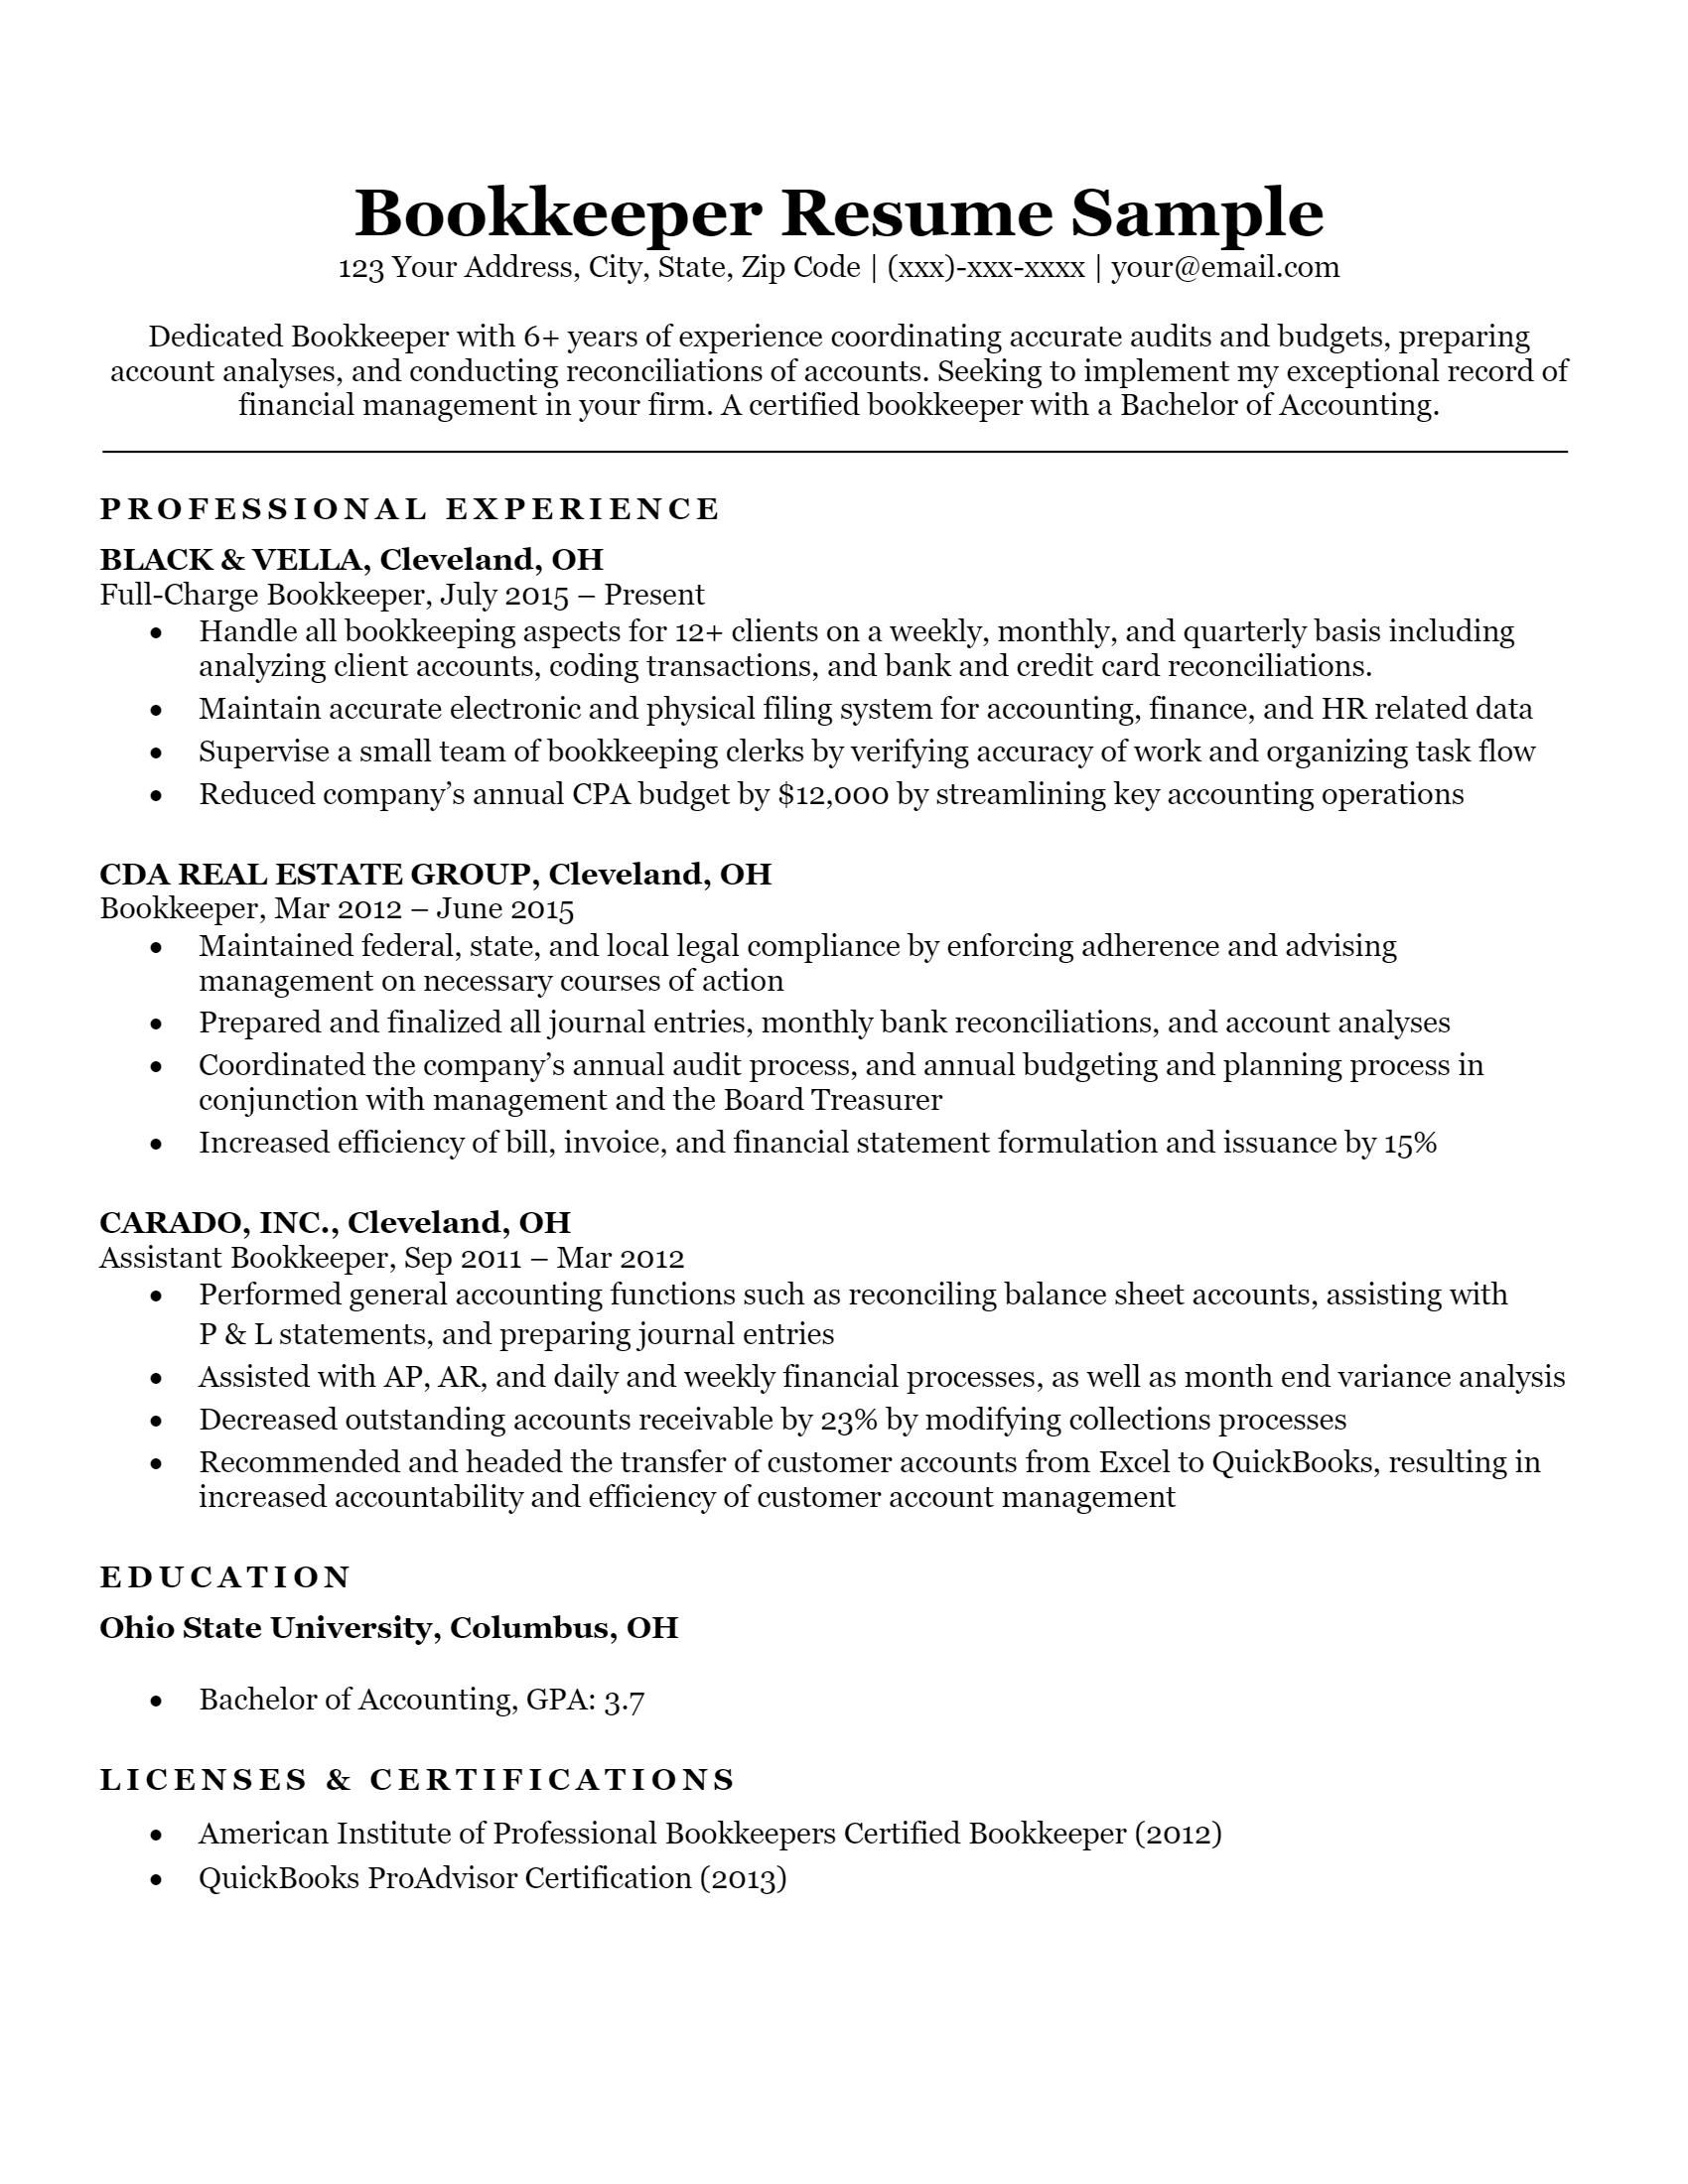 Bookkeeper Resume > Bookkeeper Resume .Docx (Word)